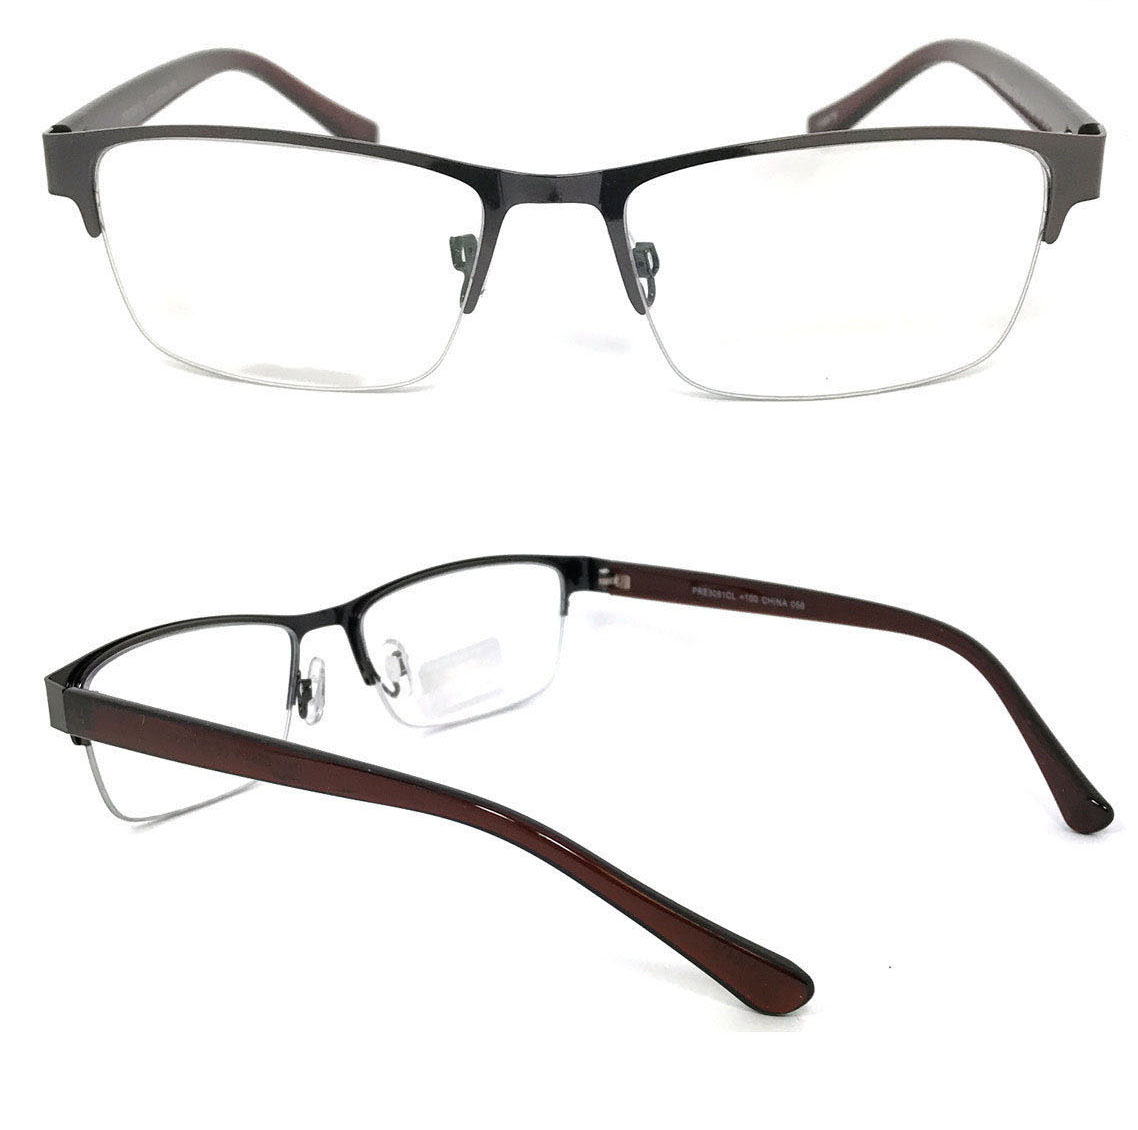 1 Pair Metal Rectangular No Line Progressive Trifocal Clear Lens Reading Glasses - Better Then Bi-Focal bifocal Reader